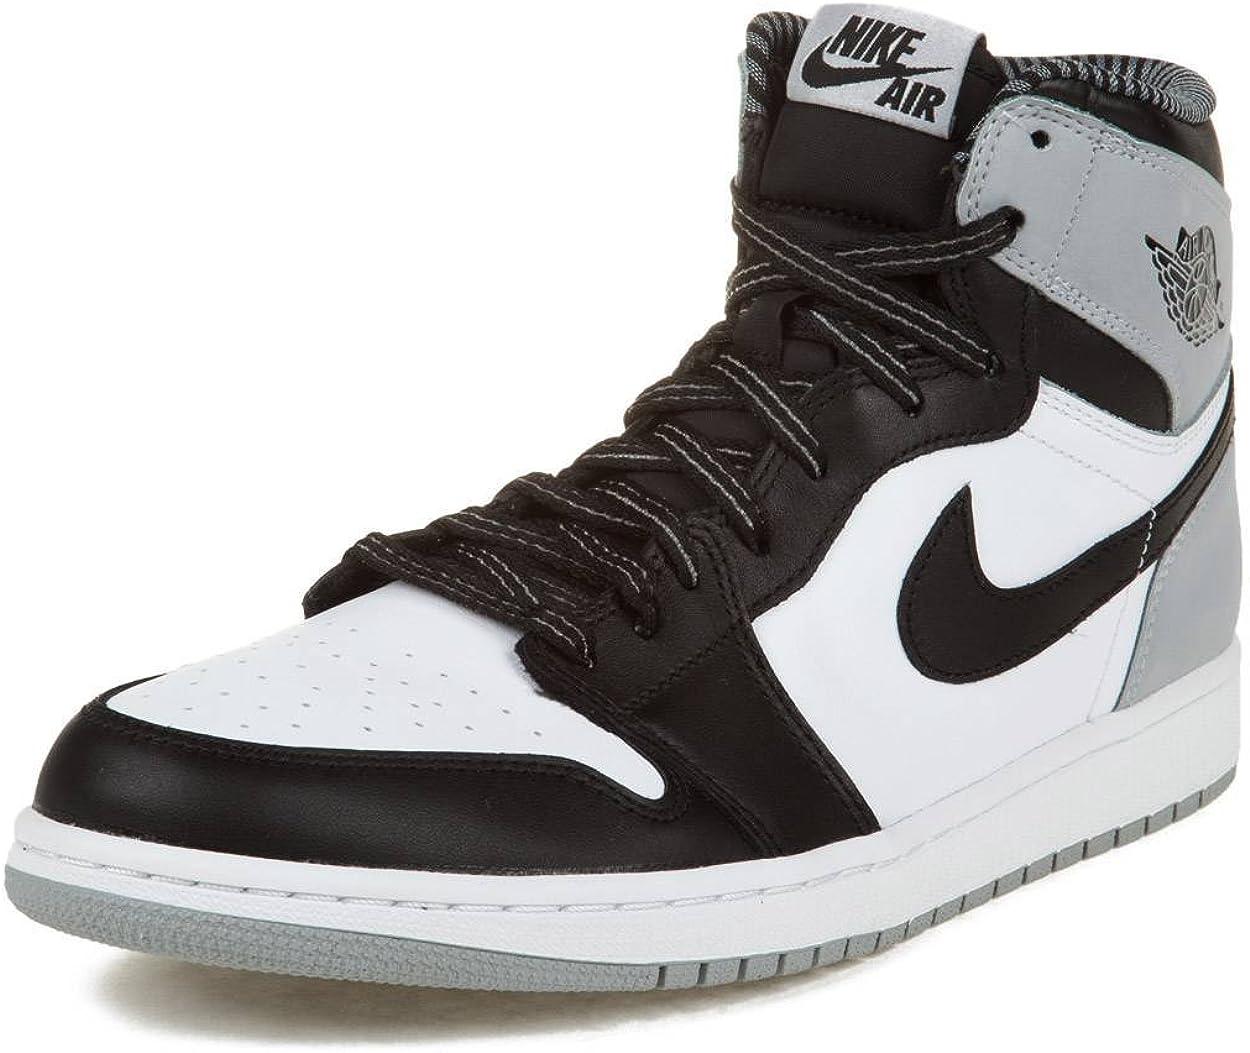 white and gray jordan 1